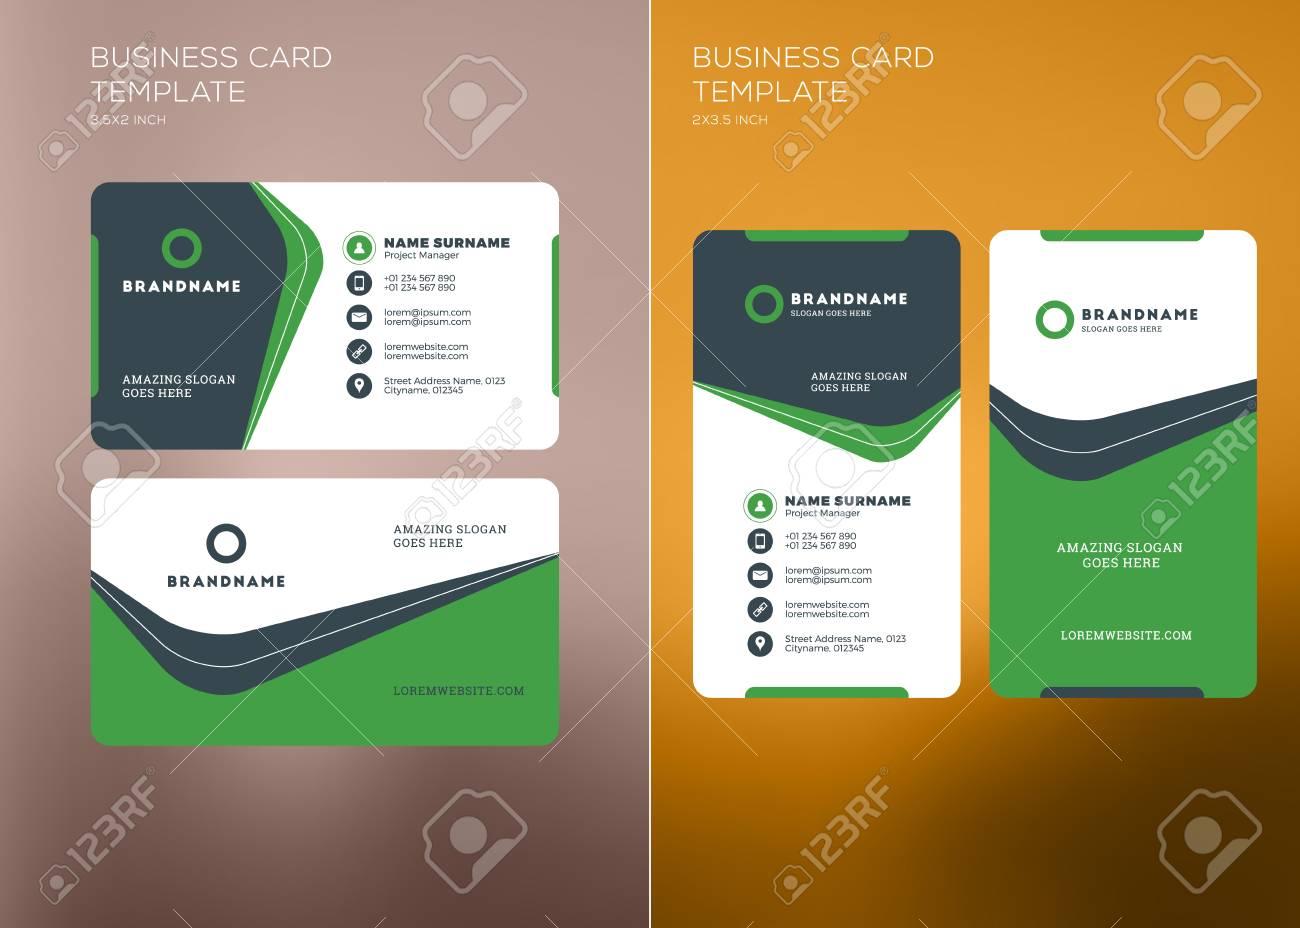 corporate business card print template personal visiting card corporate business card print template personal visiting card